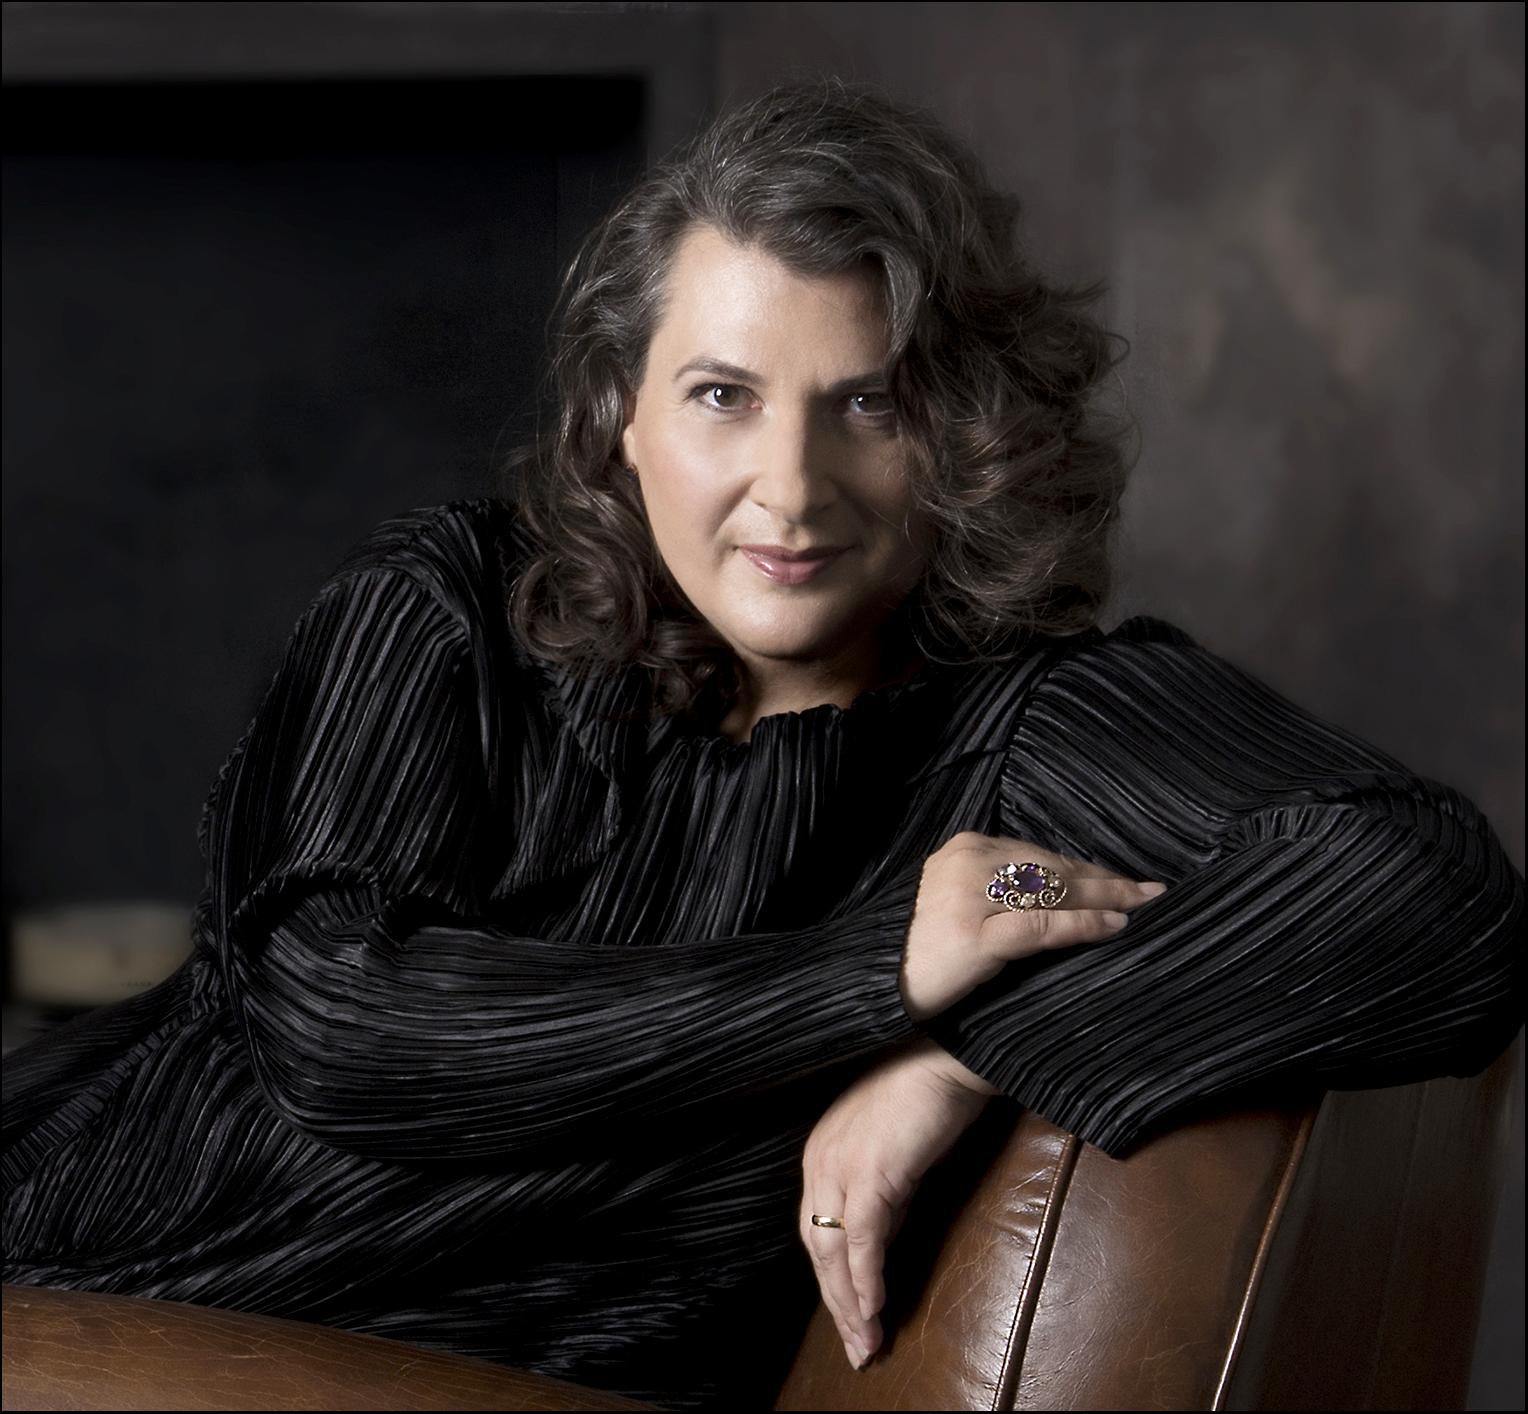 Janina Baechle